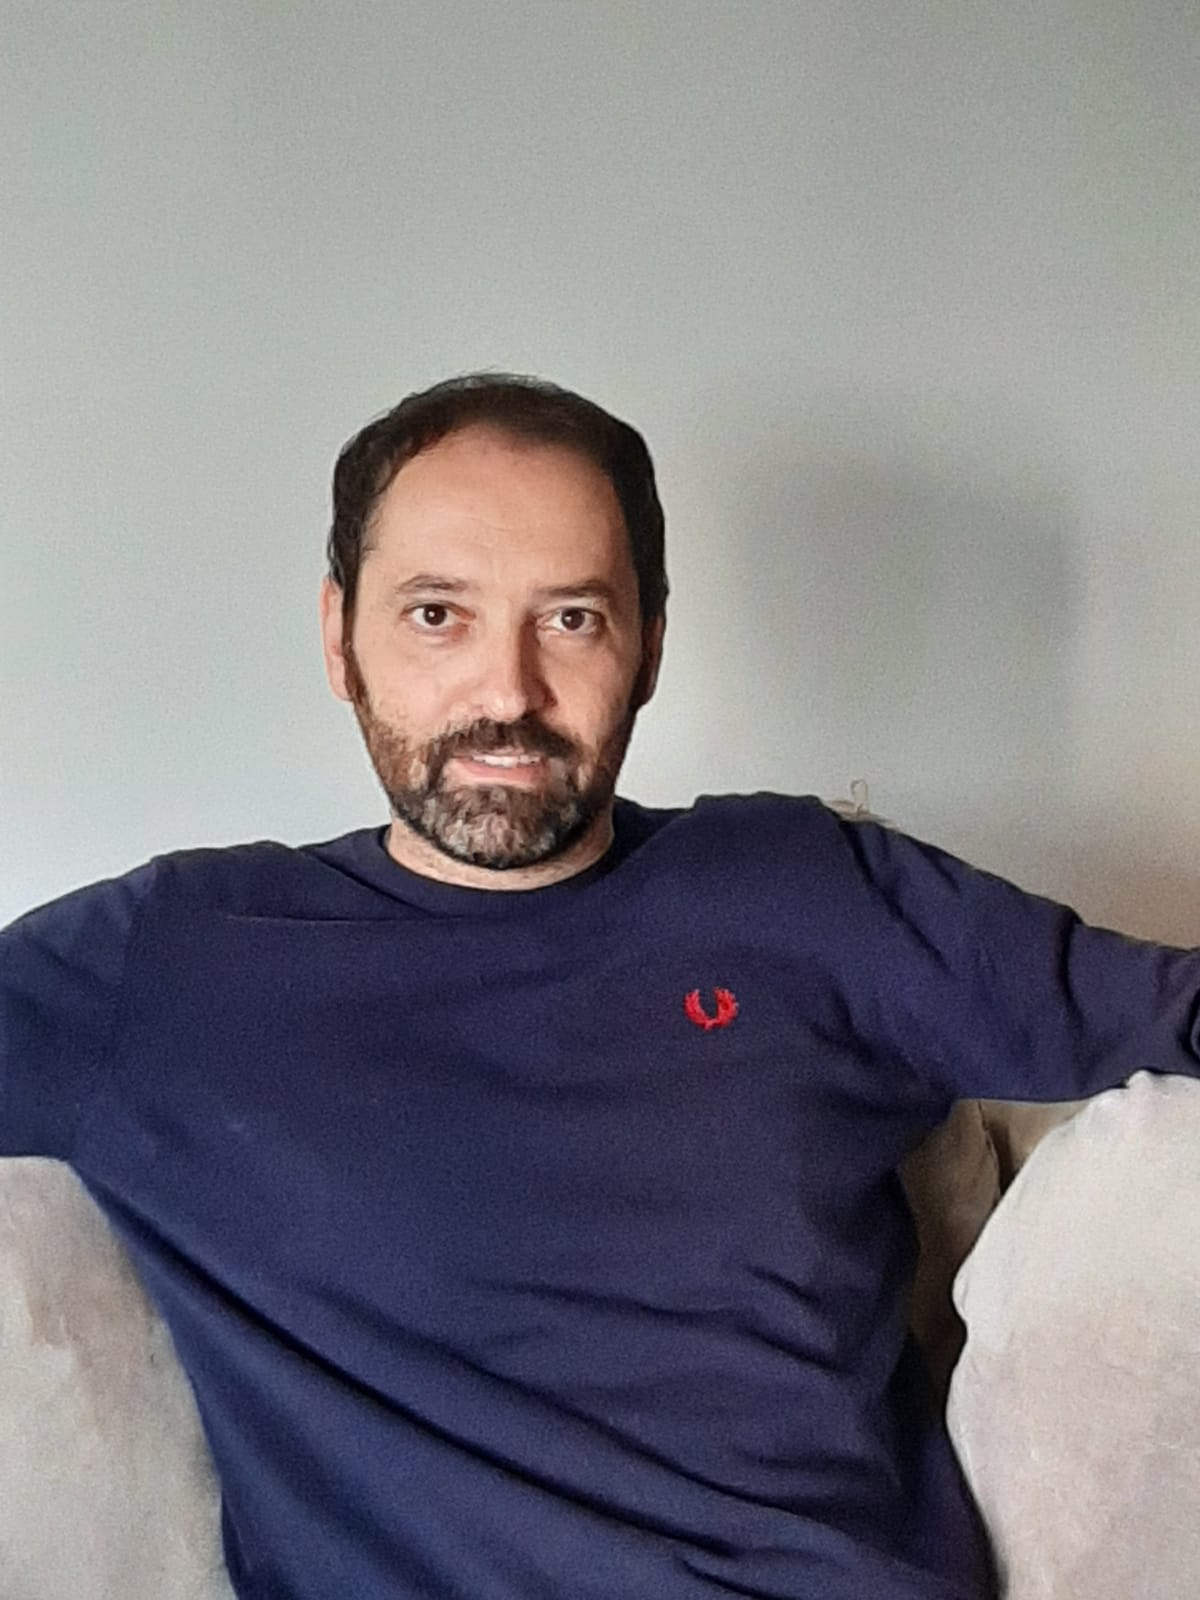 Stefano Menna